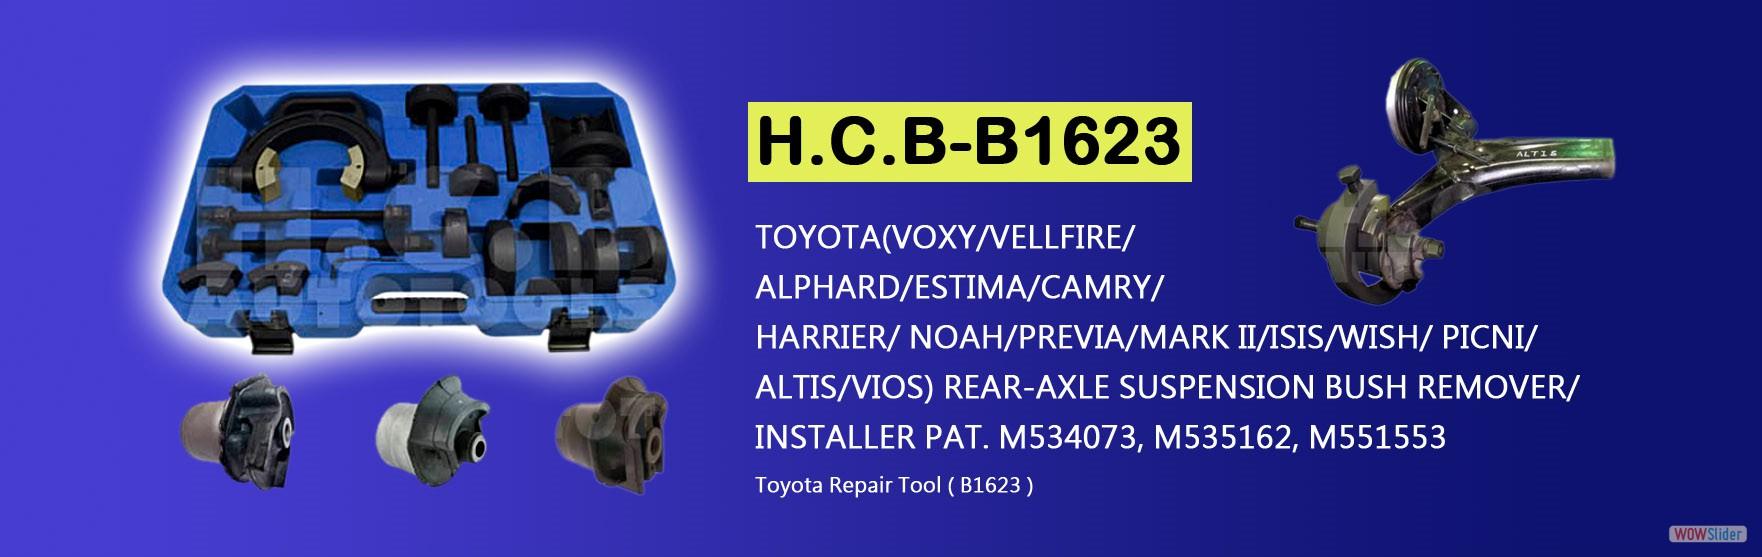 HCB Auto Tools - BMW TRANSMISSION REPAIR TOOLS